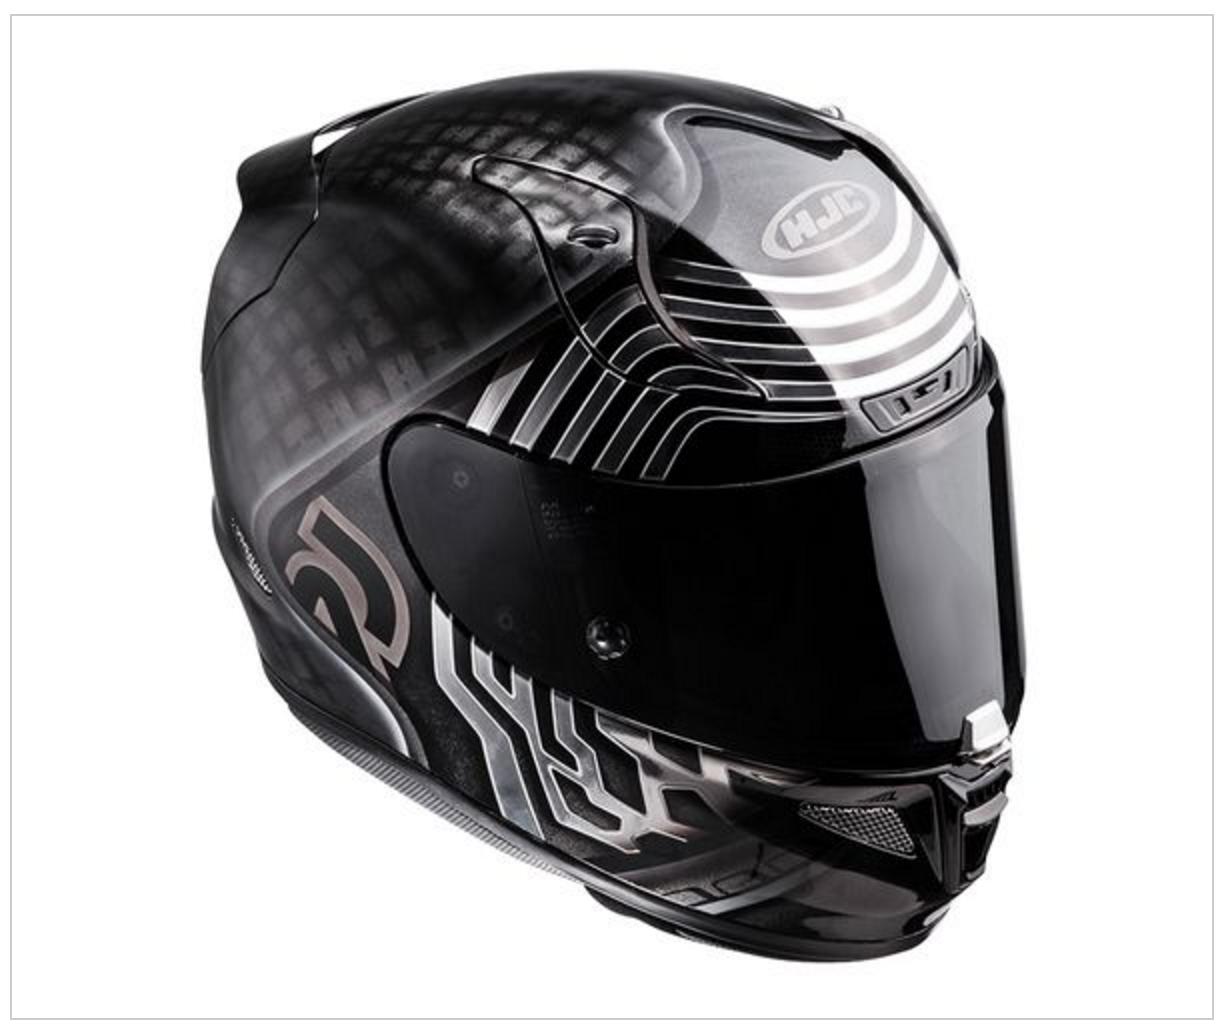 Carbon Fiber Motorcycle Helmets >> Kylo Ren Motorcycle Helmets